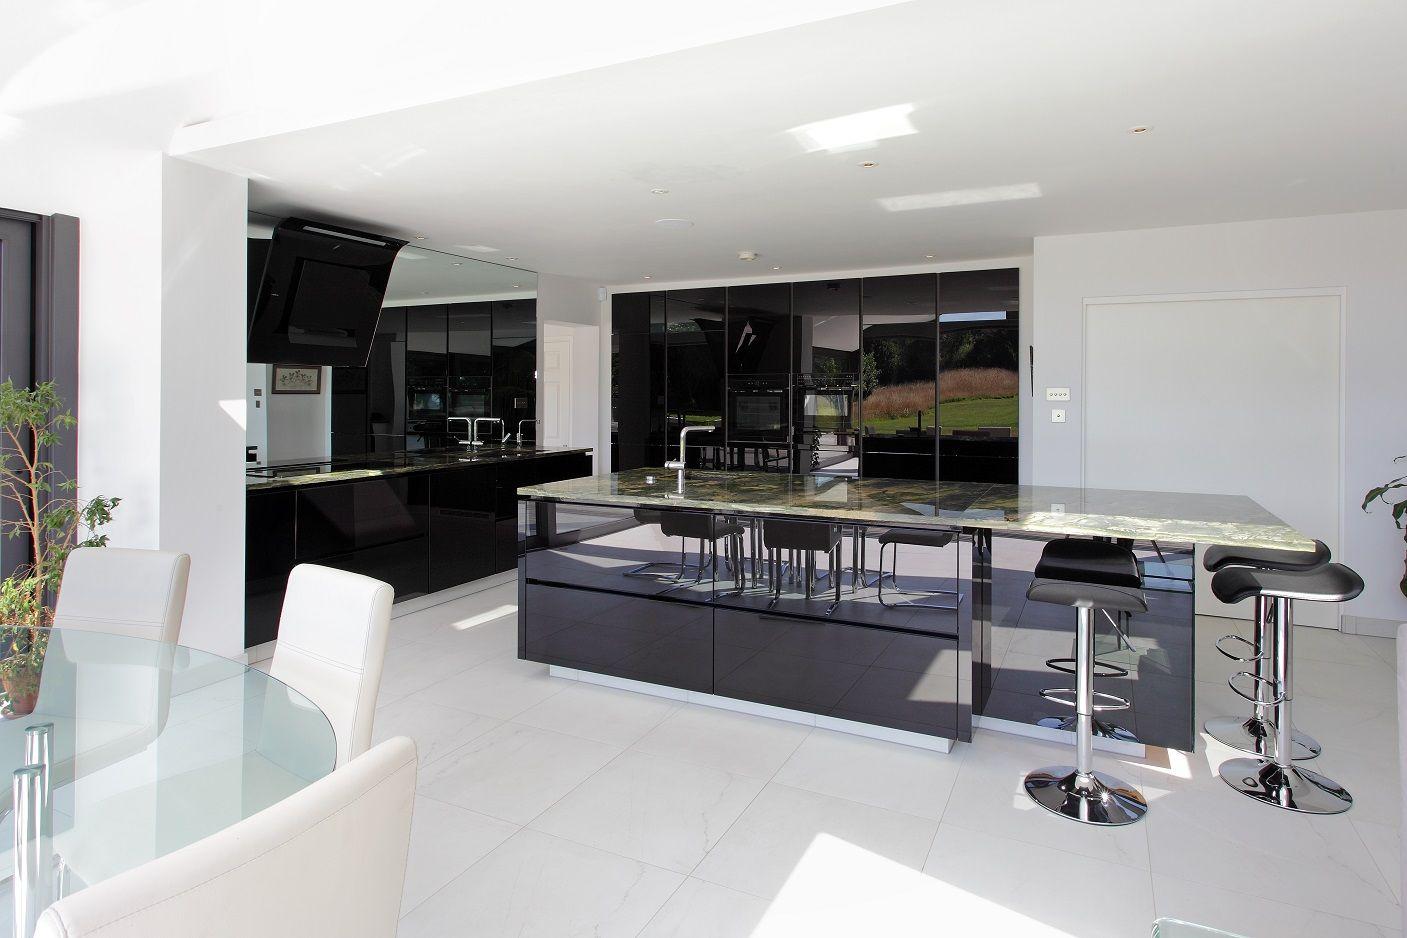 Alno Kitchens Remodeling   Alno kitchen, Kitchen remodel, Kitchen seating area